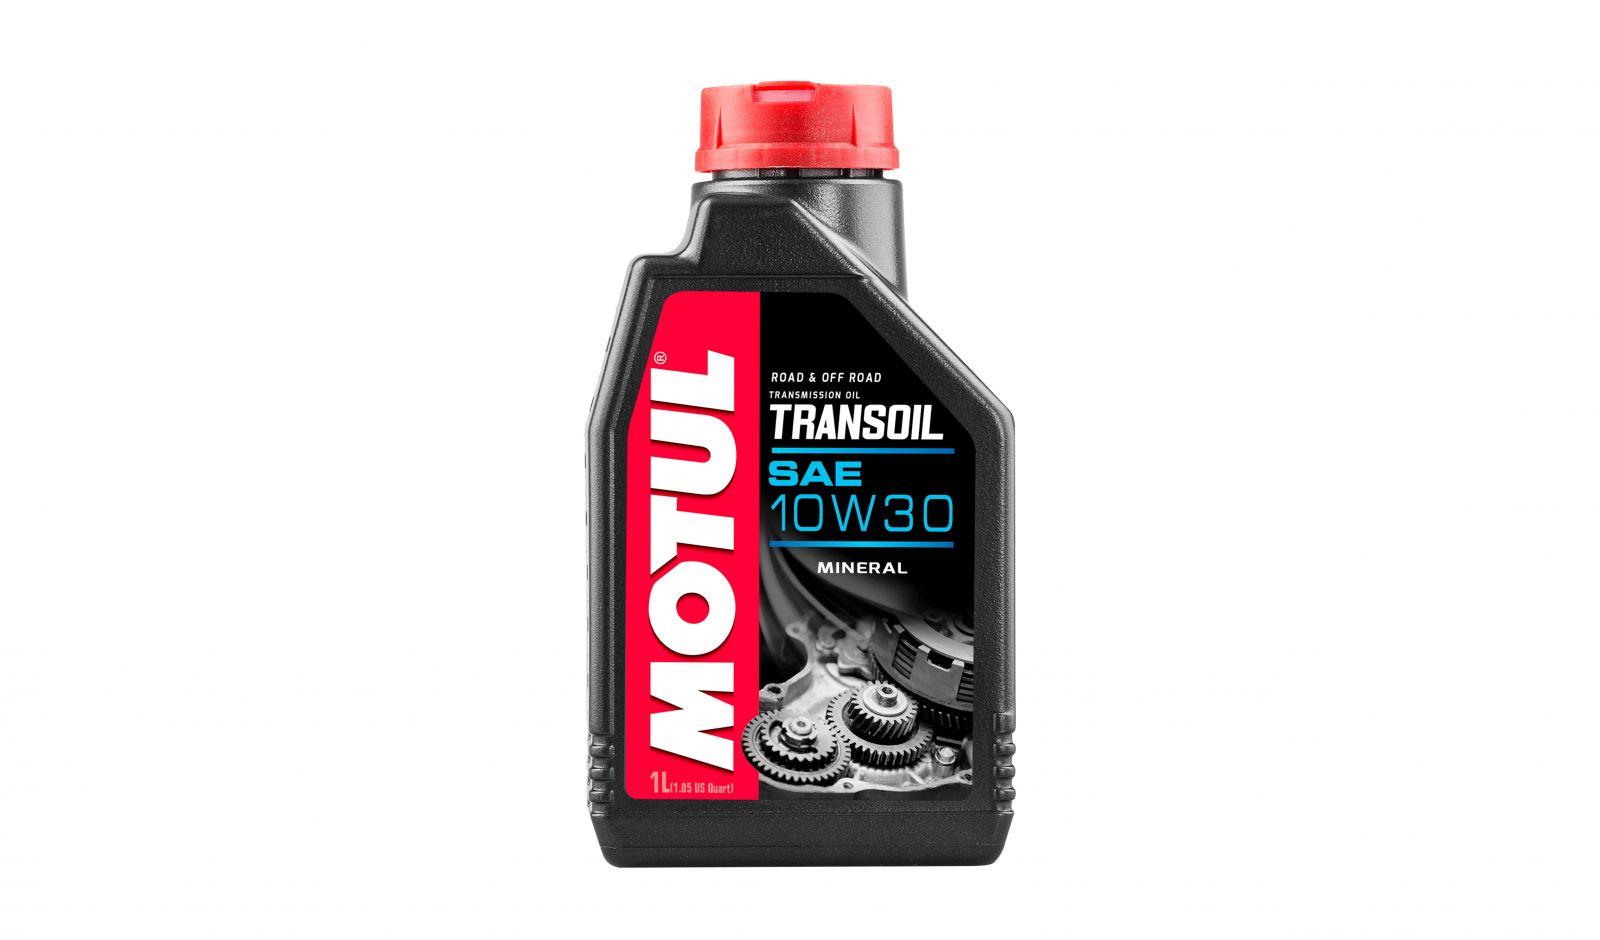 Transmission & Gear Oils - 670471M image